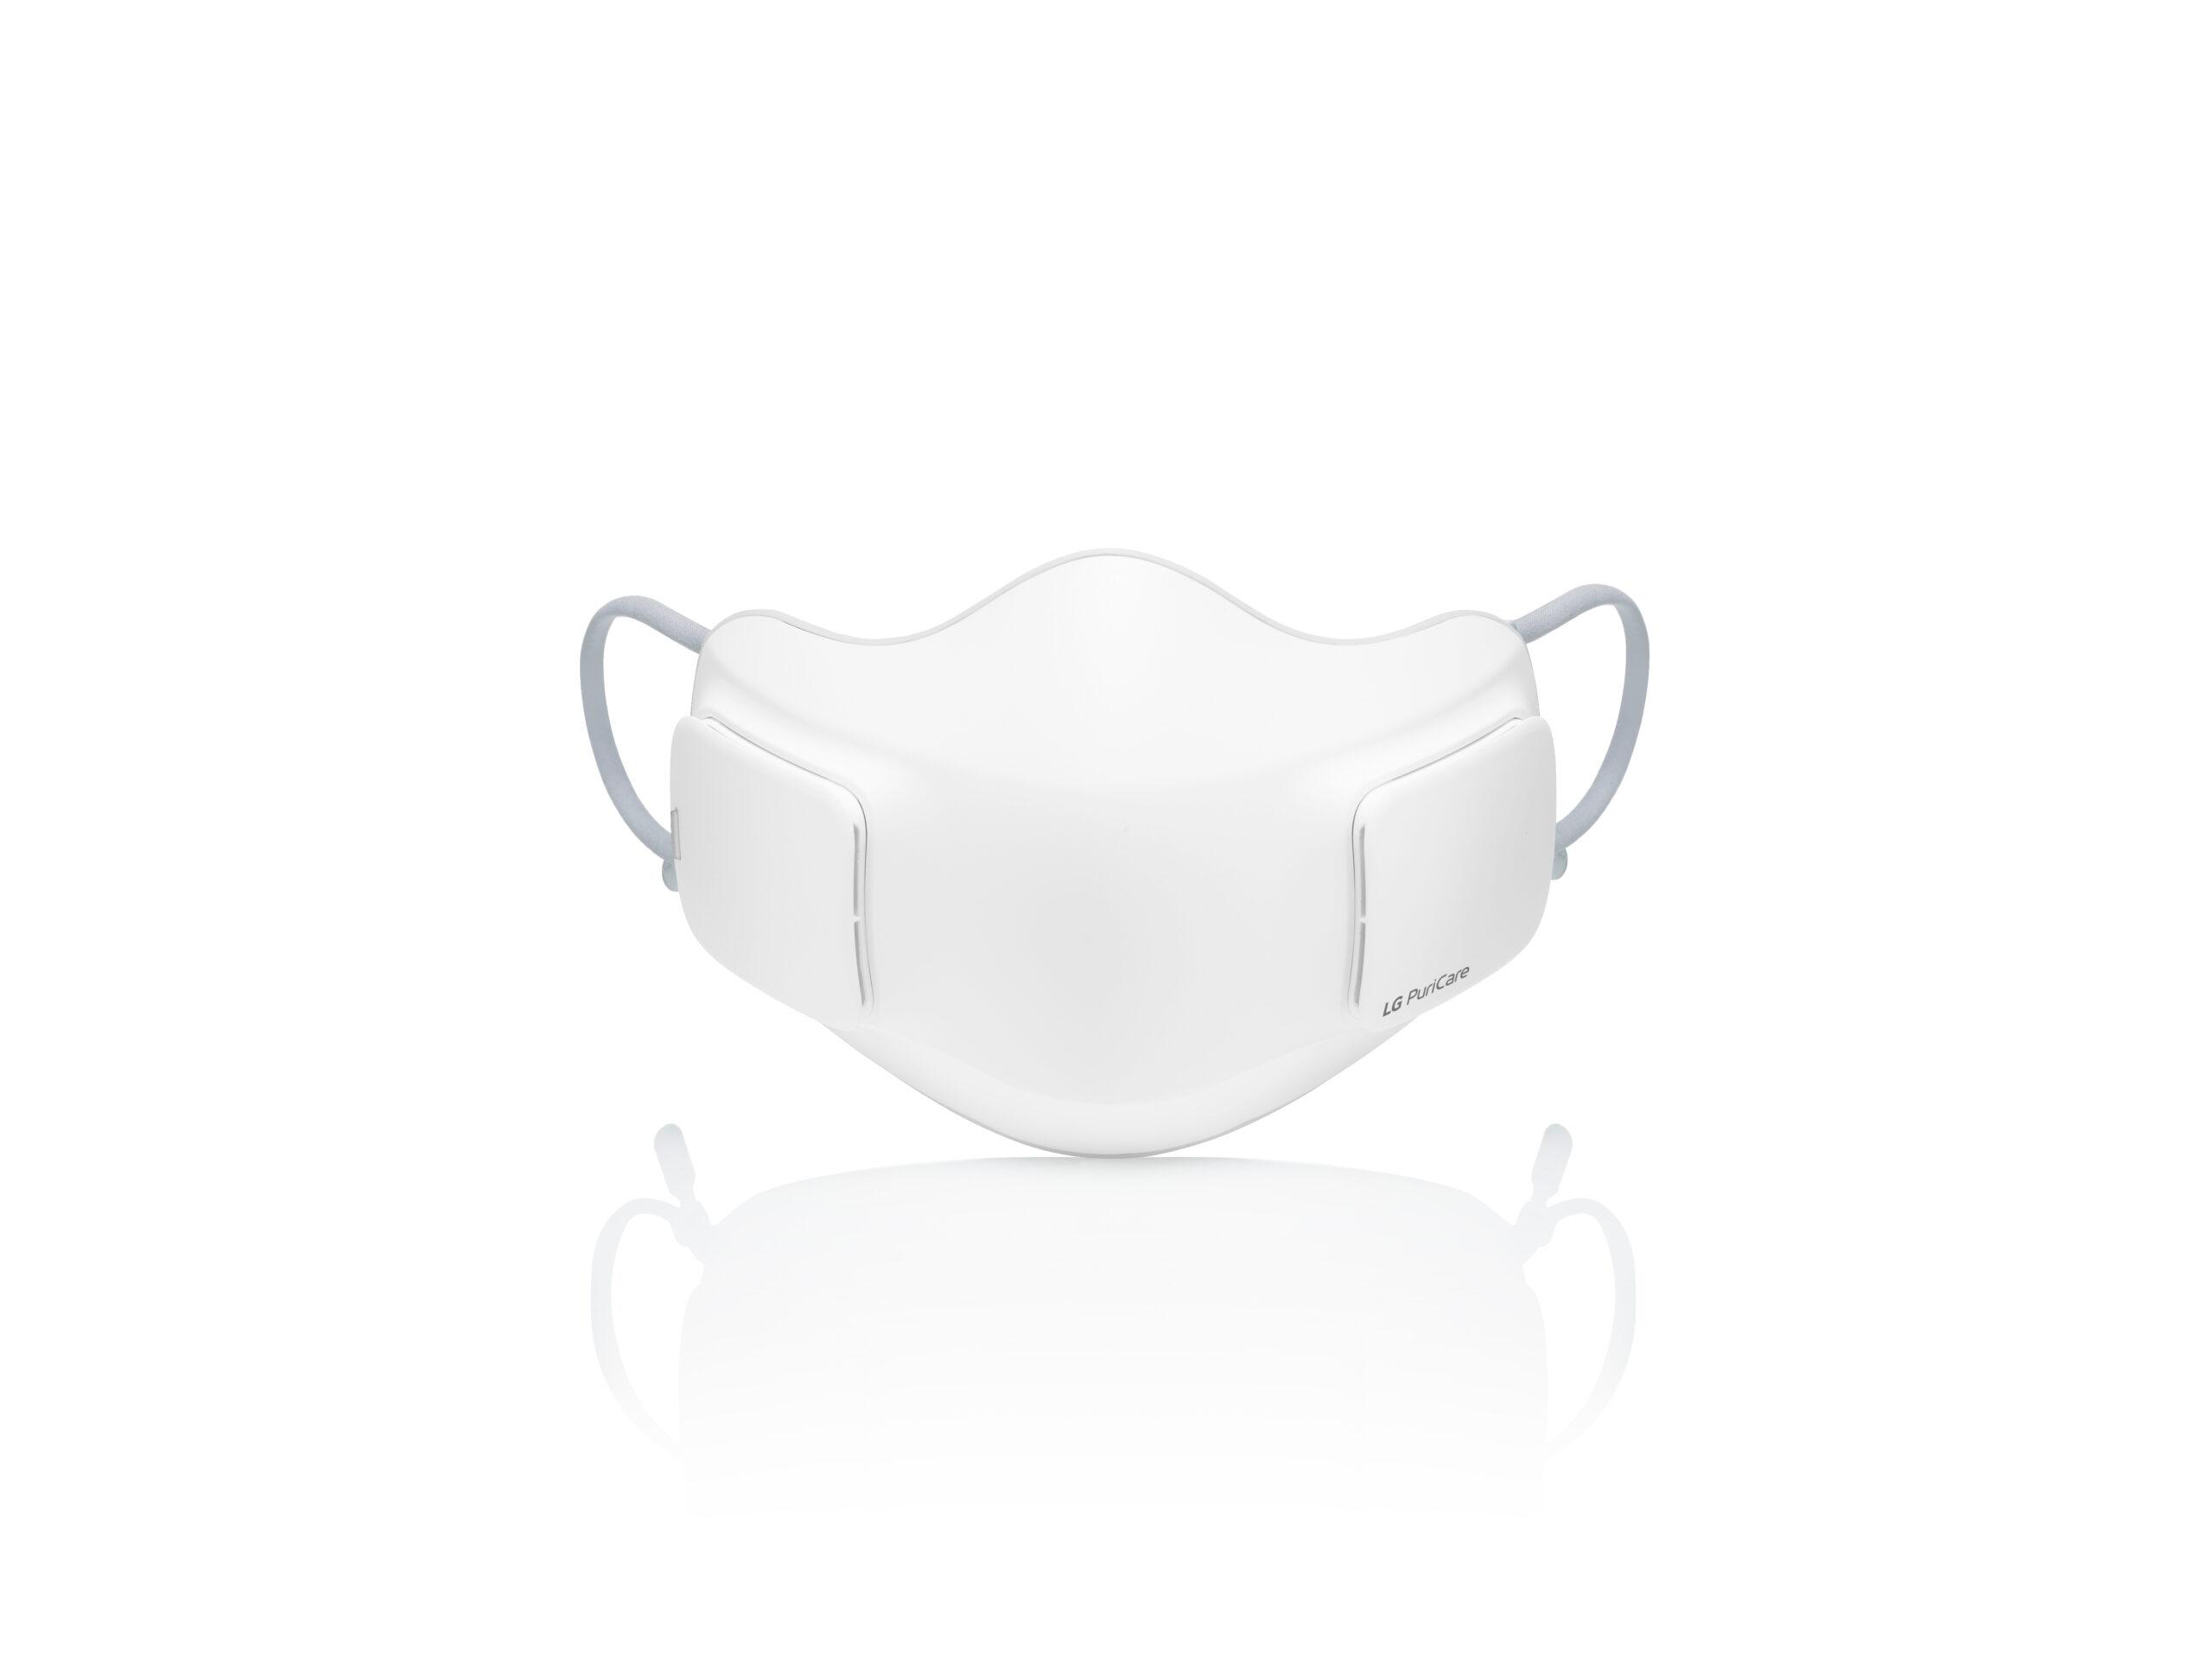 Masker Covid-19 LG PuriCare